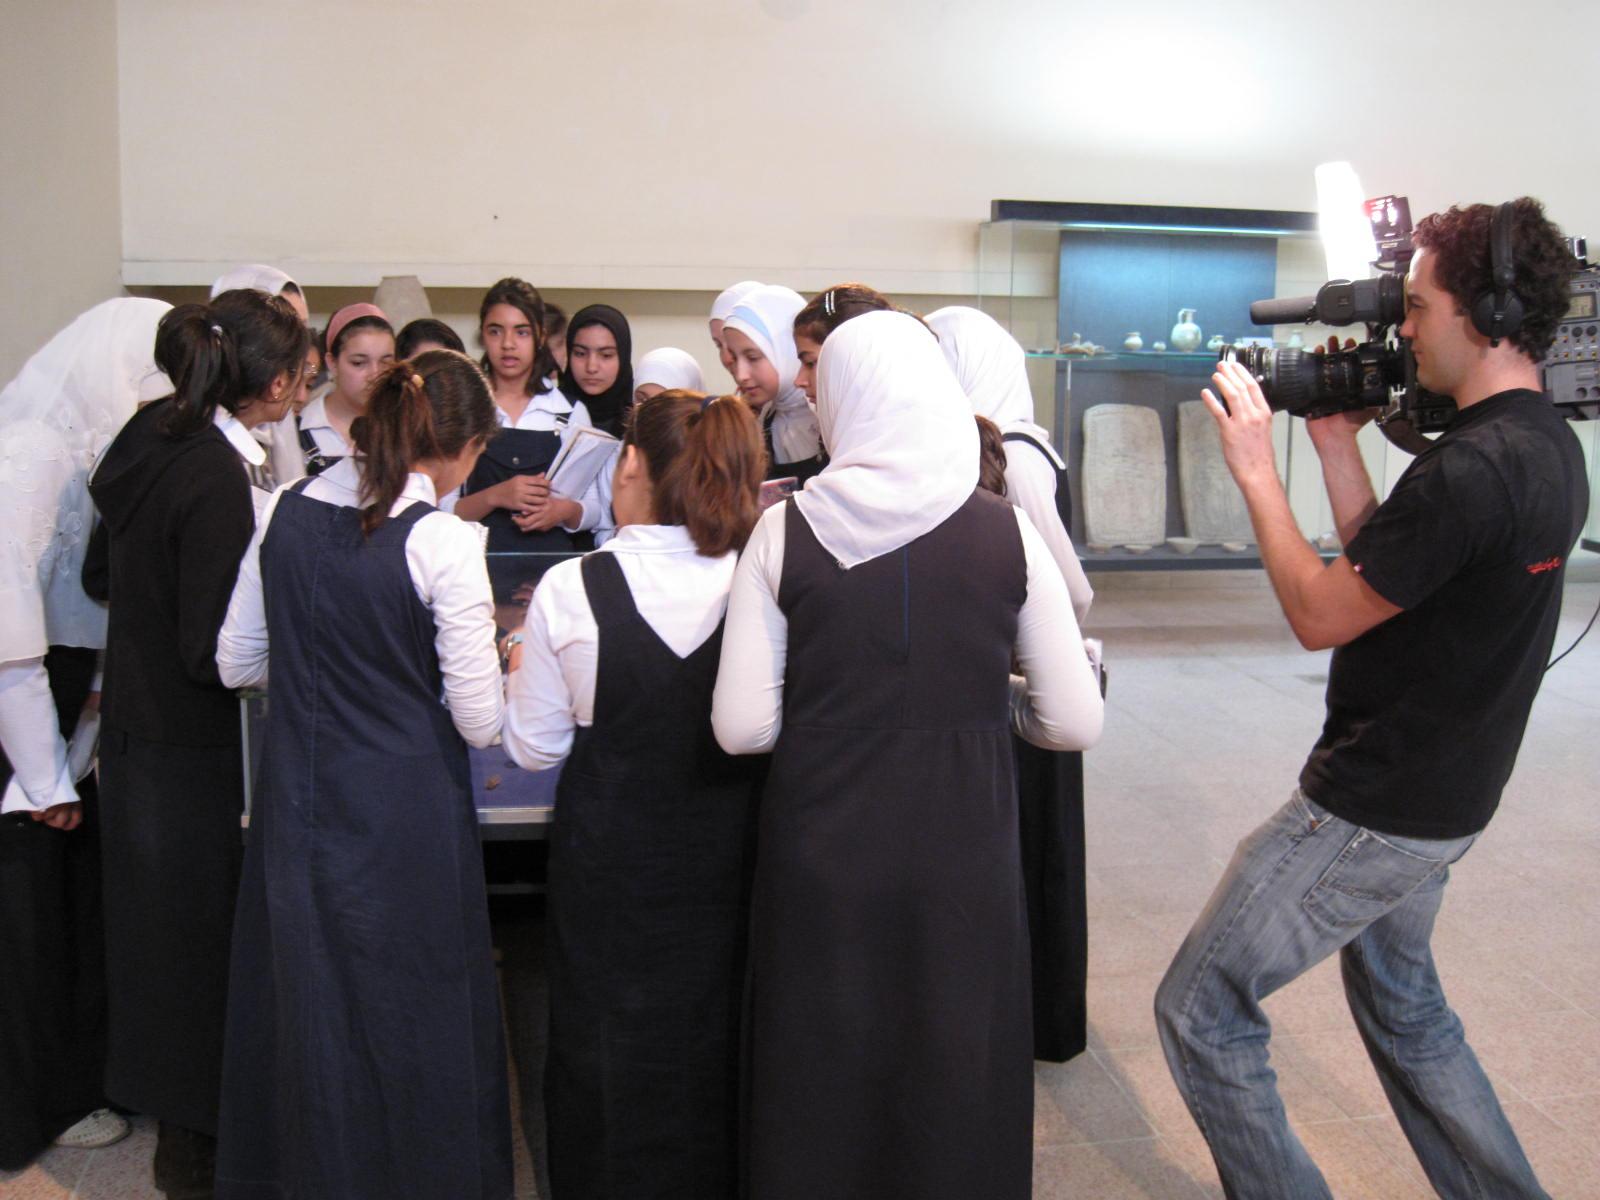 Mohammed Tawfeeq/CNN